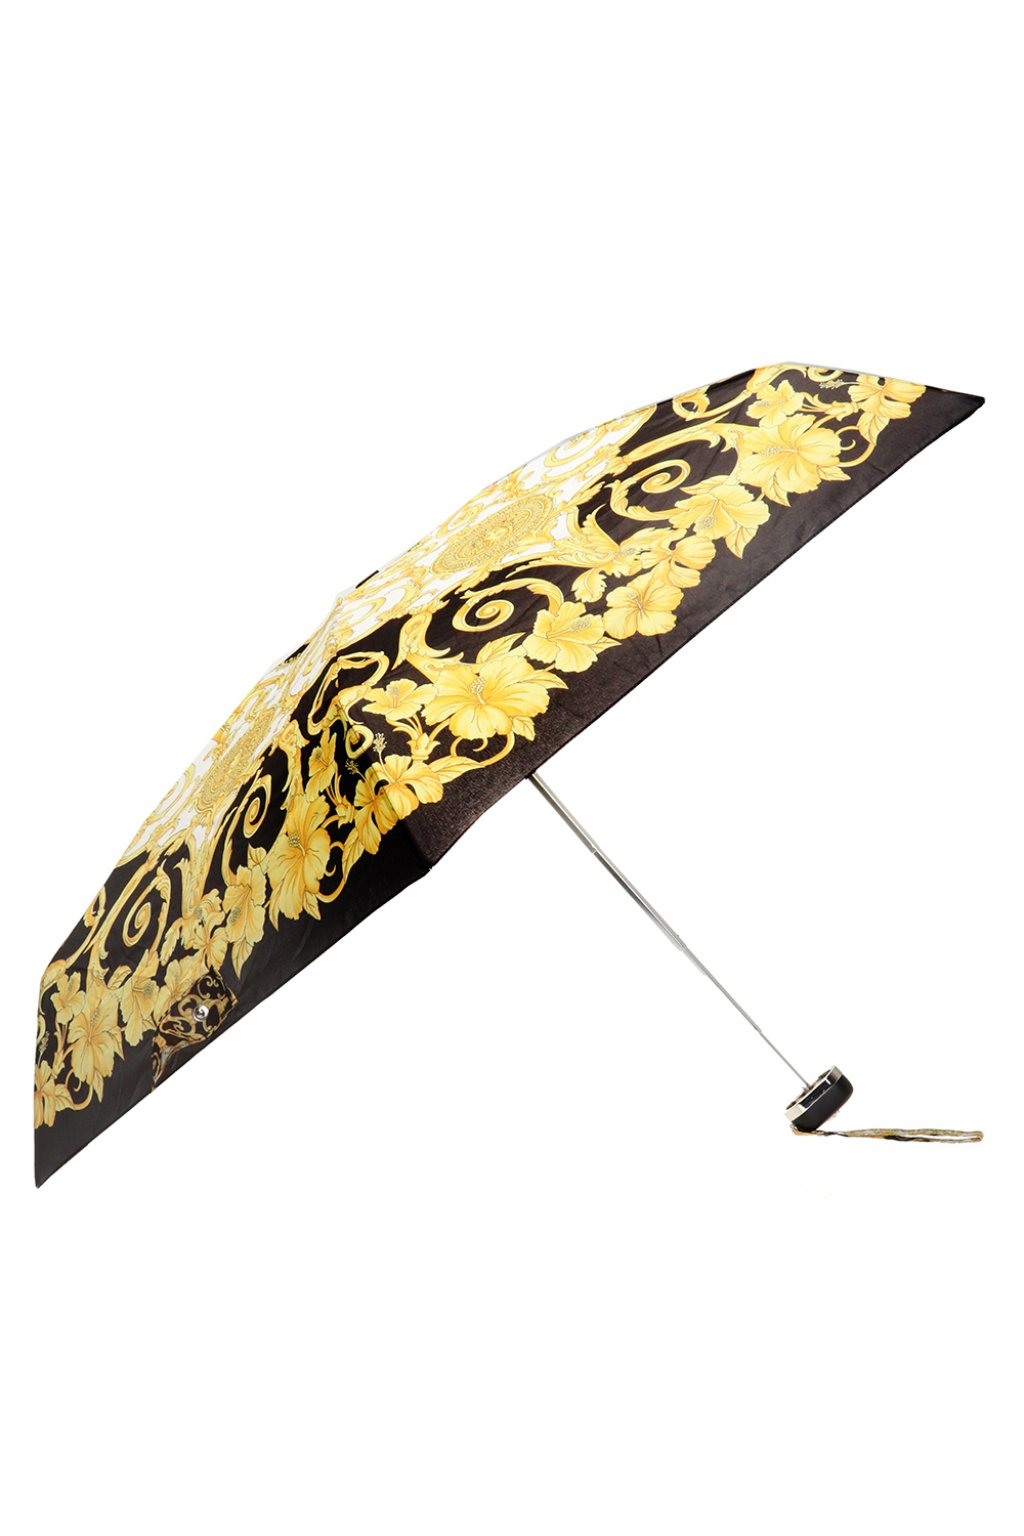 Versace Umbrella Paraguas Umbrella Ombrello 12552